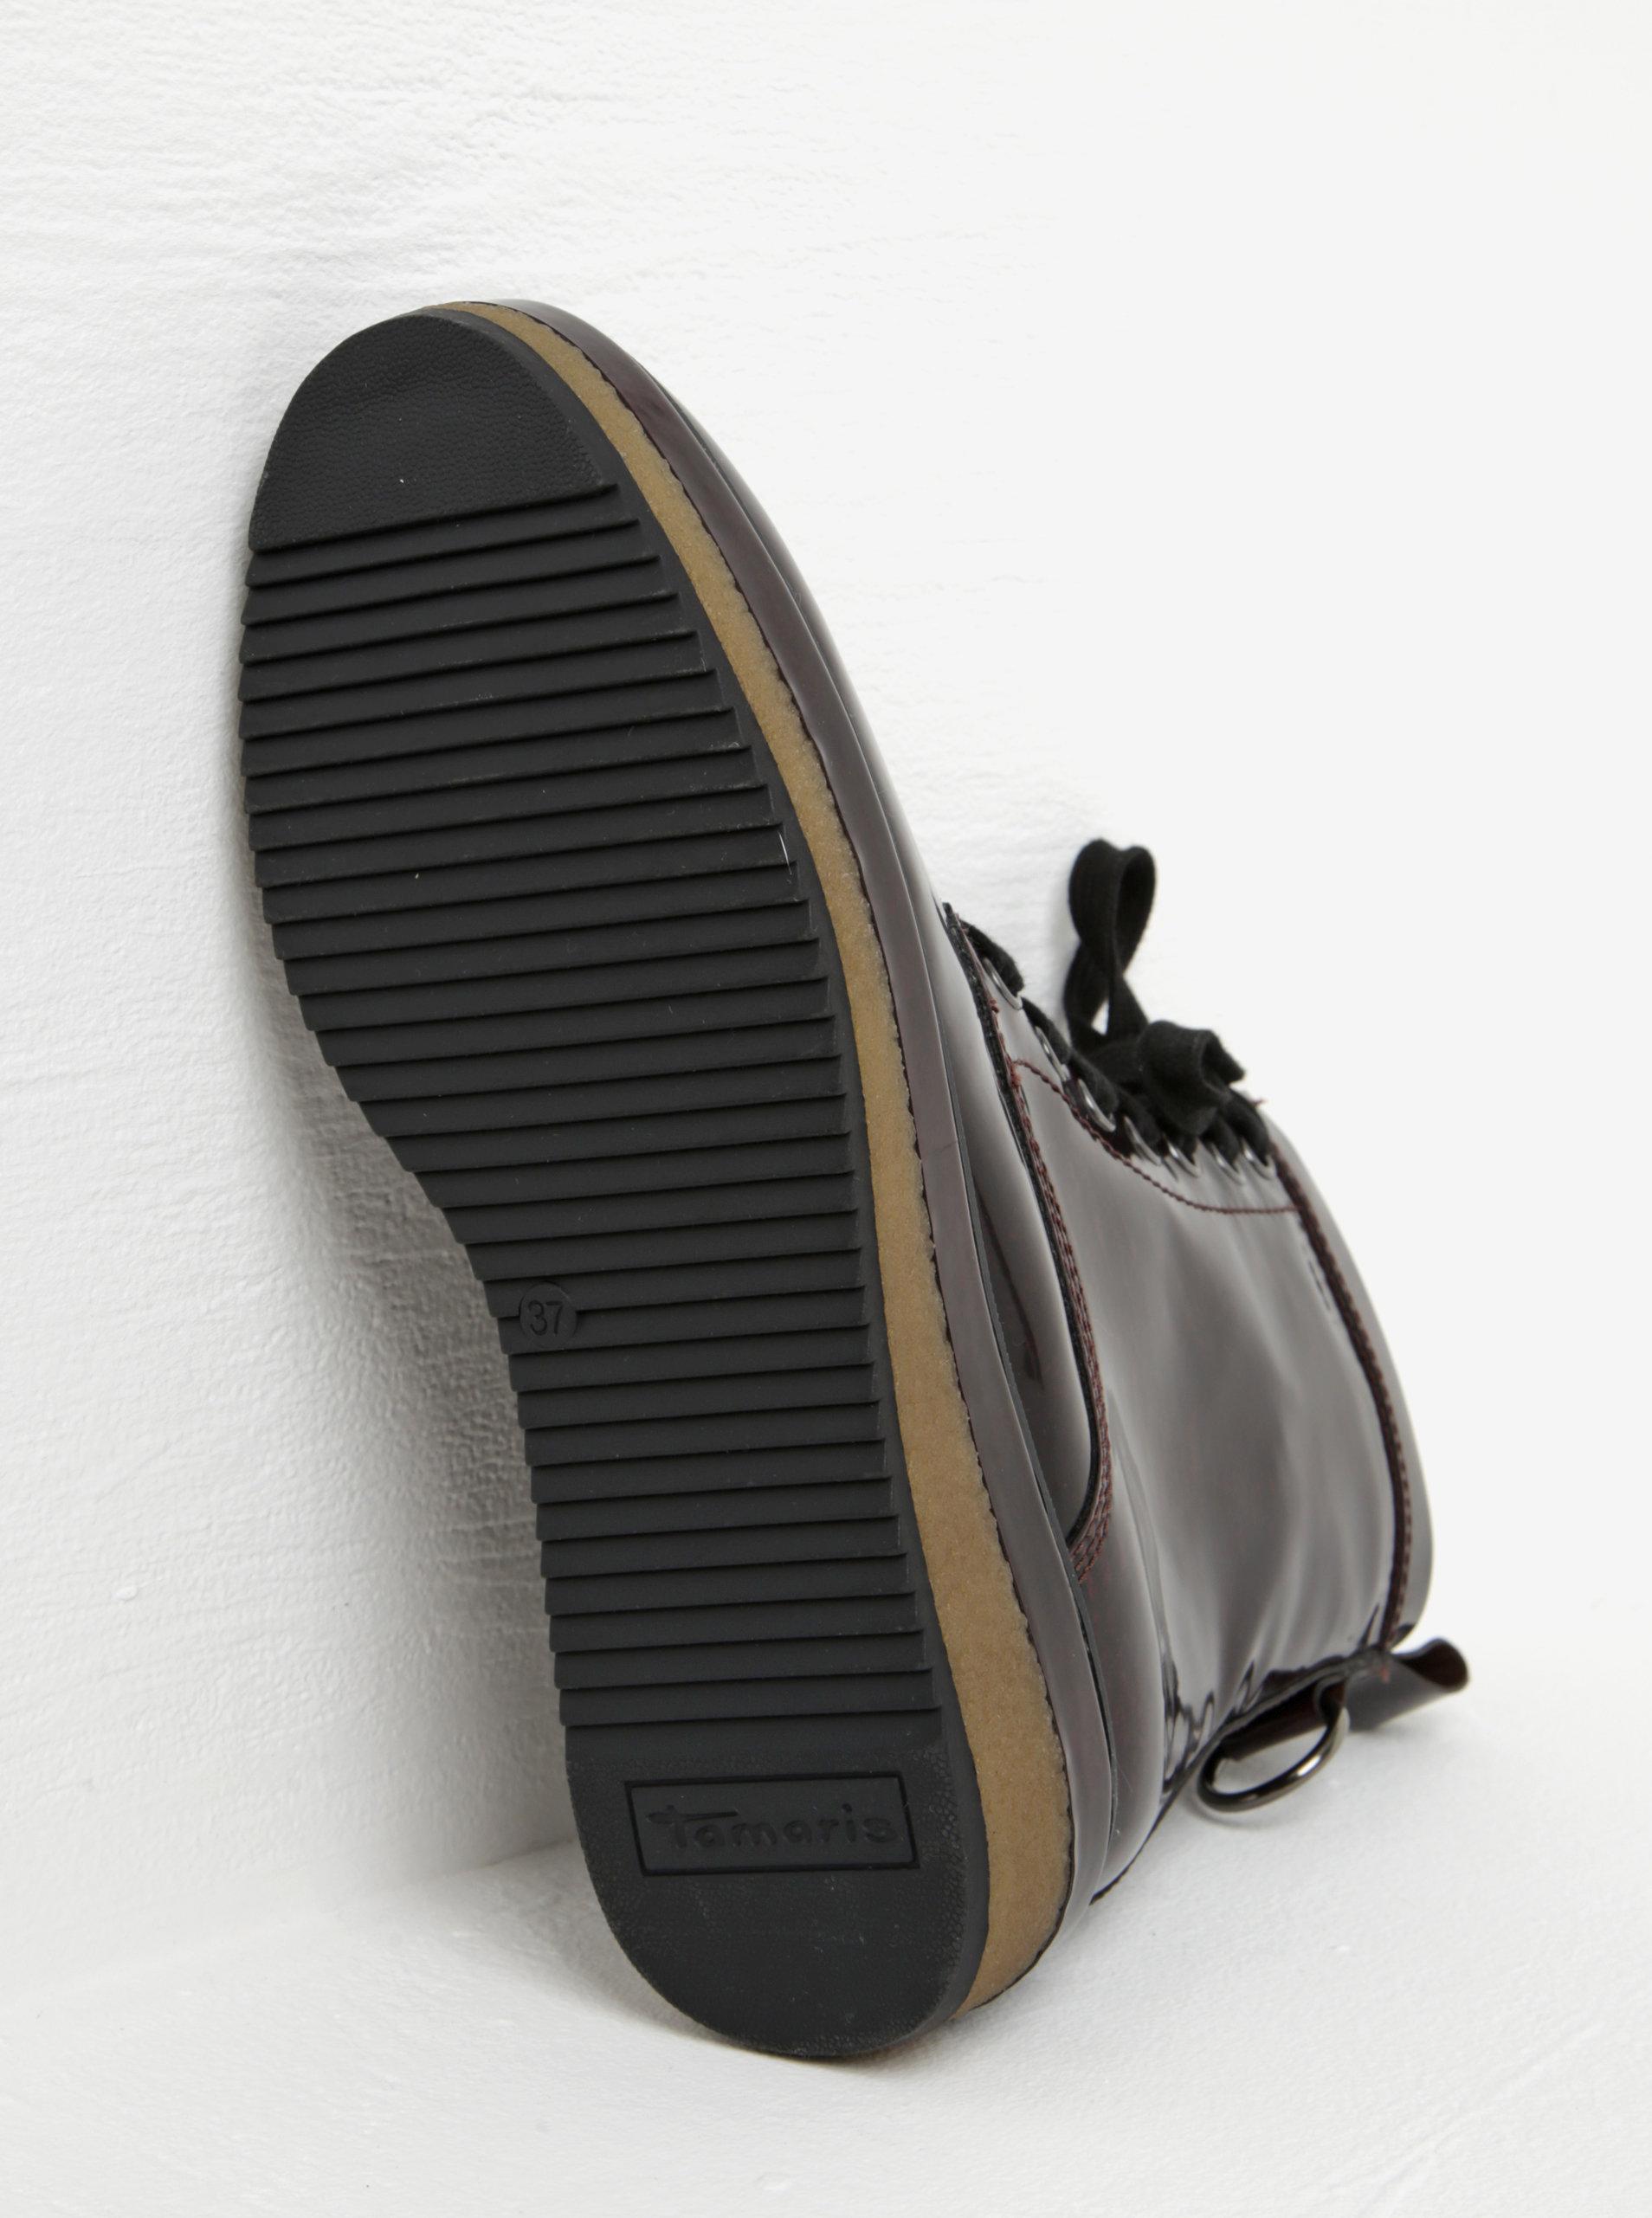 a9a16cea0b32 Vínové lesklé členkové topánky na platforme Tamaris ...